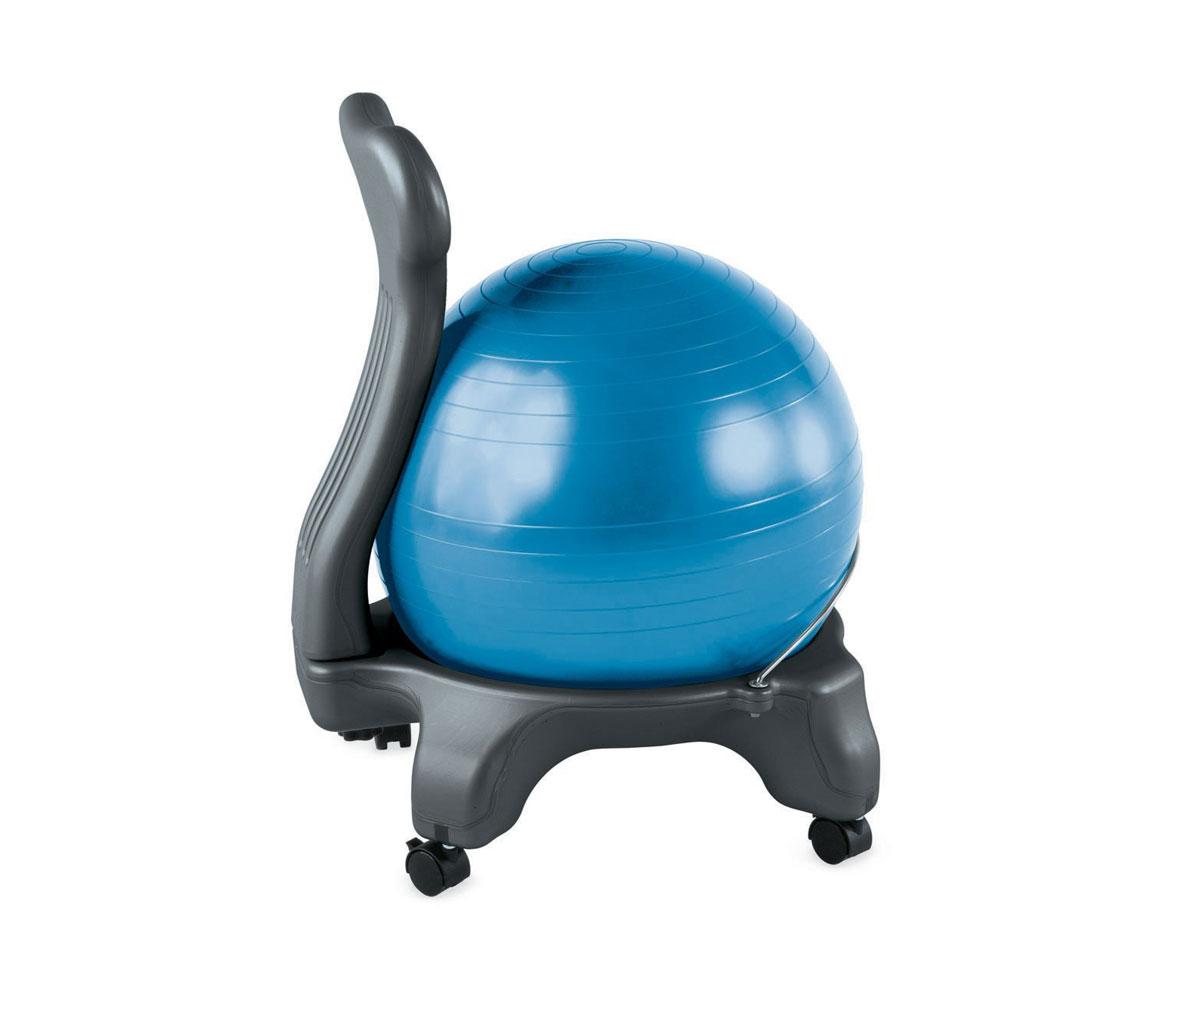 posture fixer chair club chairs walmart gaiam balance ball ergonomics fix